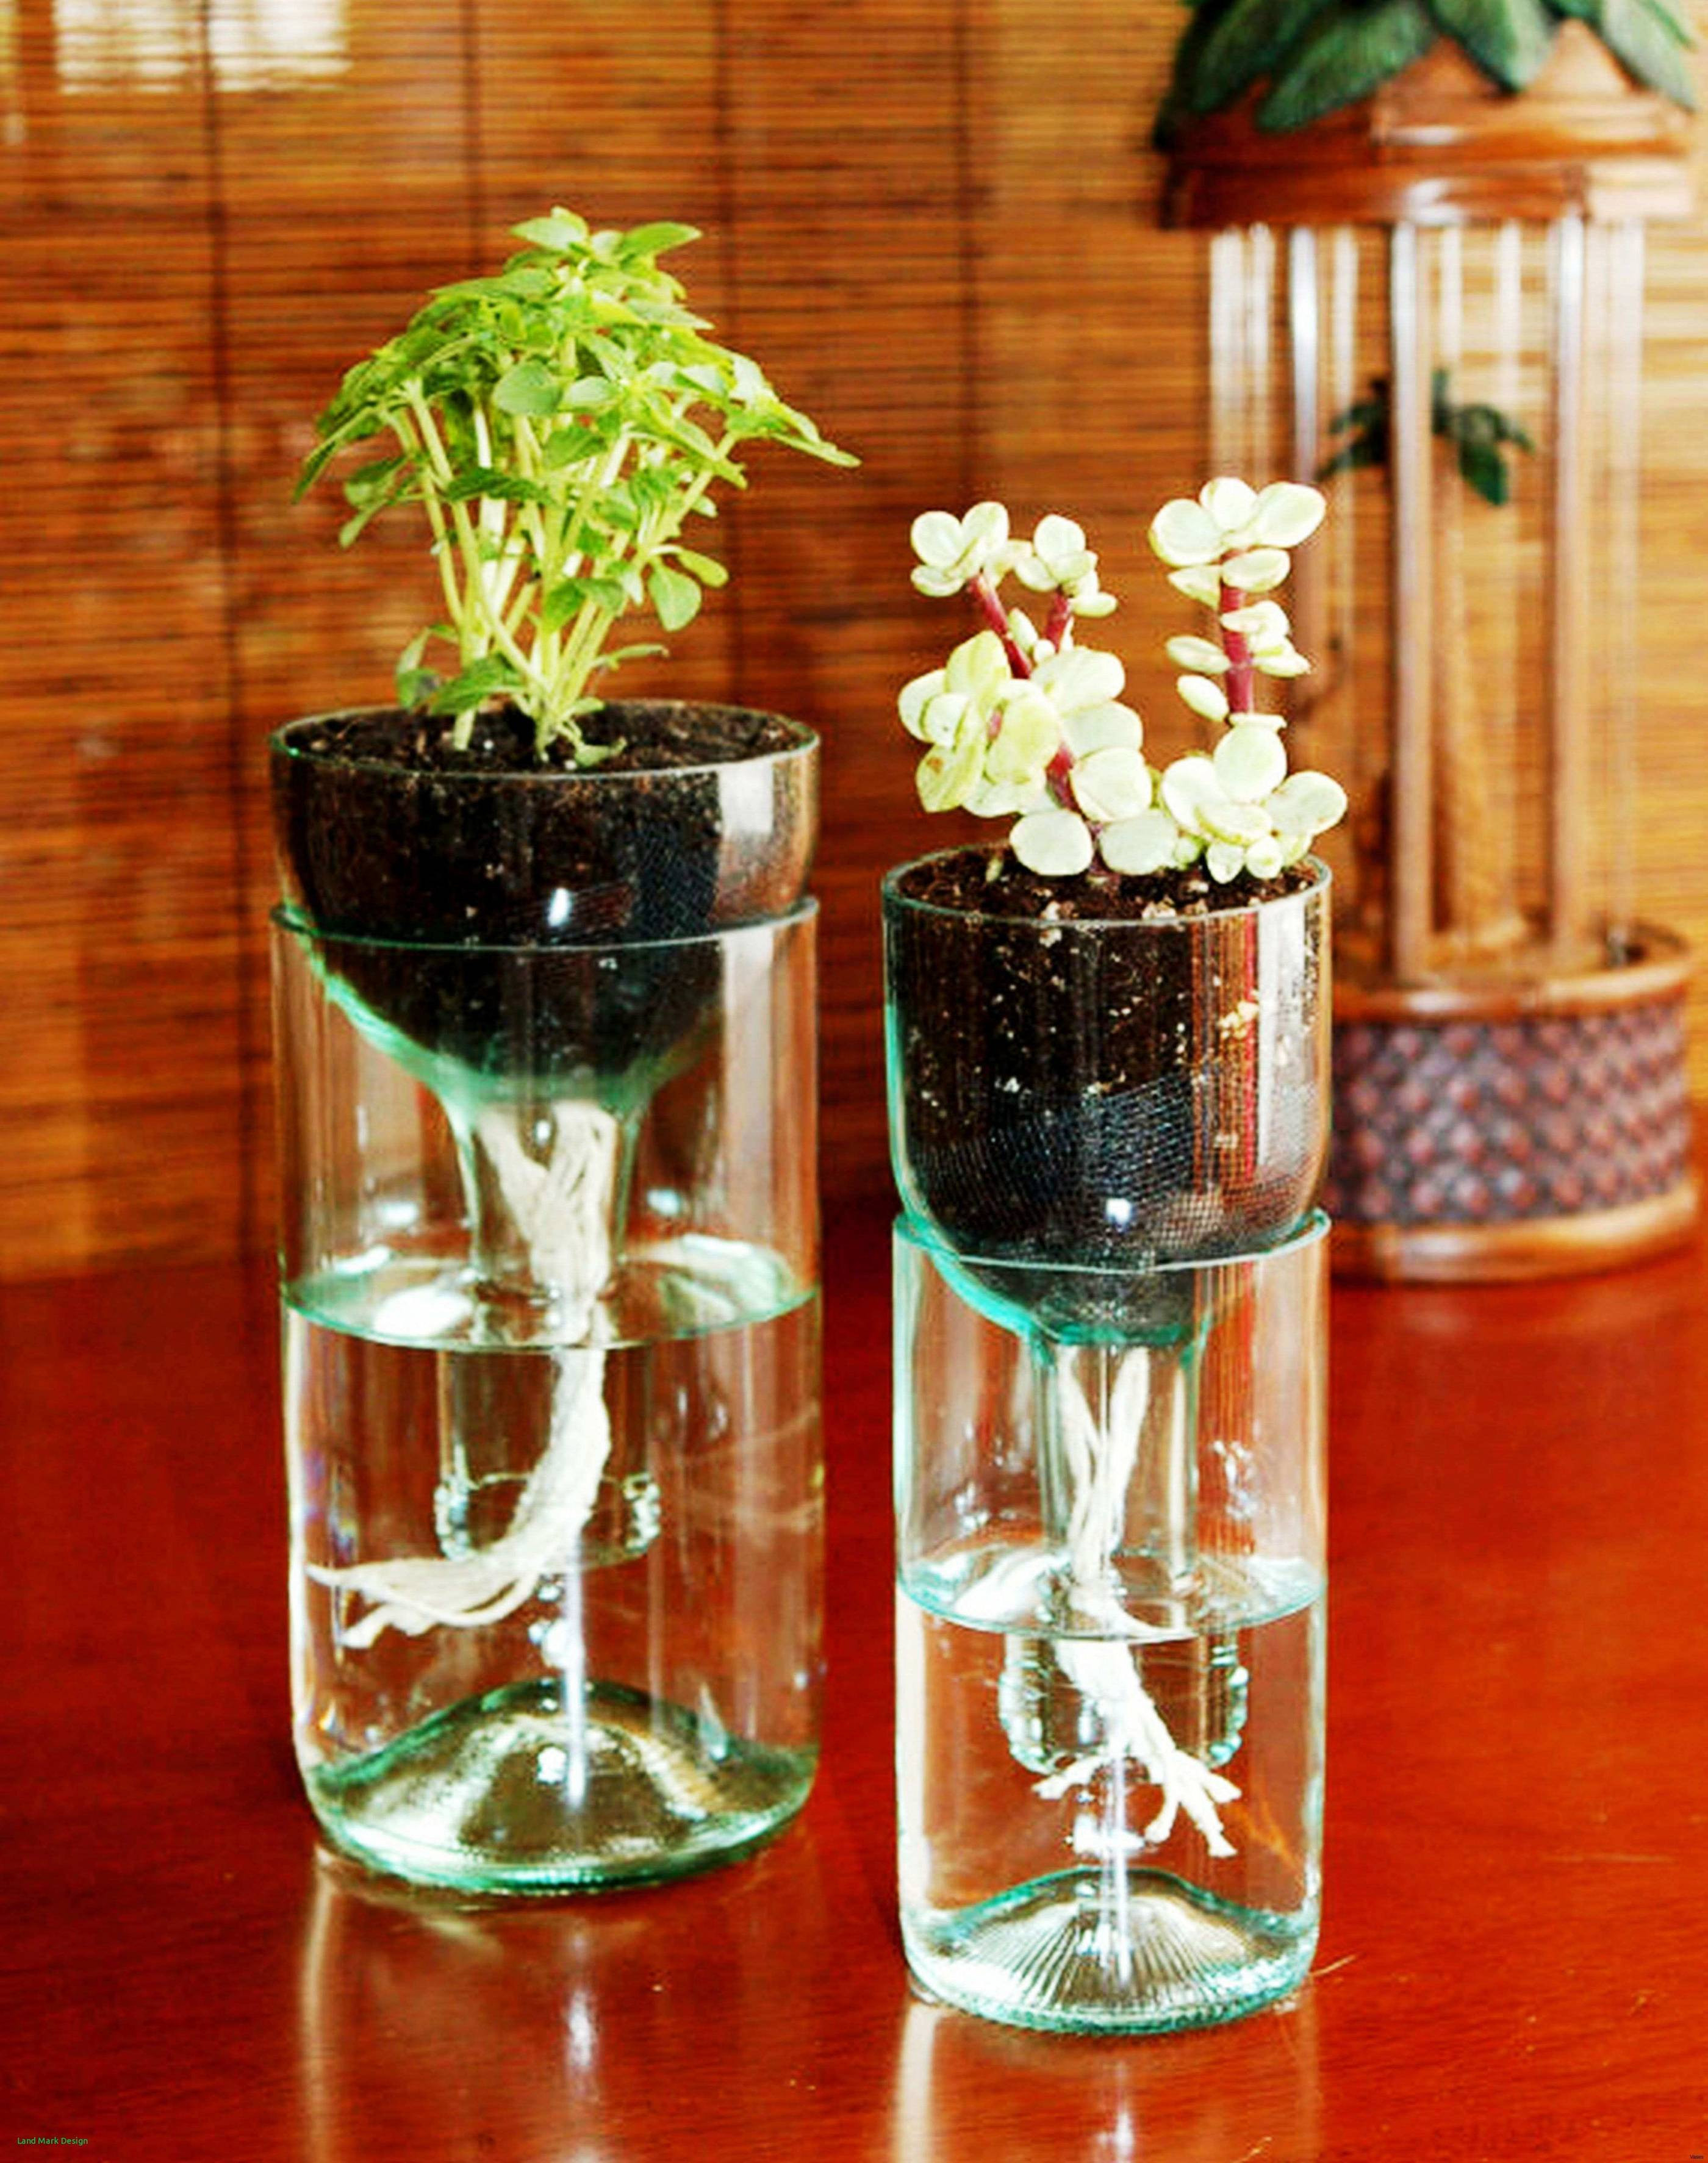 big white flower vase of 10 flower pot ideas favorite for elegant room splusna com page with stunning flower vase decoration home on diy interior ideas with homeh vases homei 0d